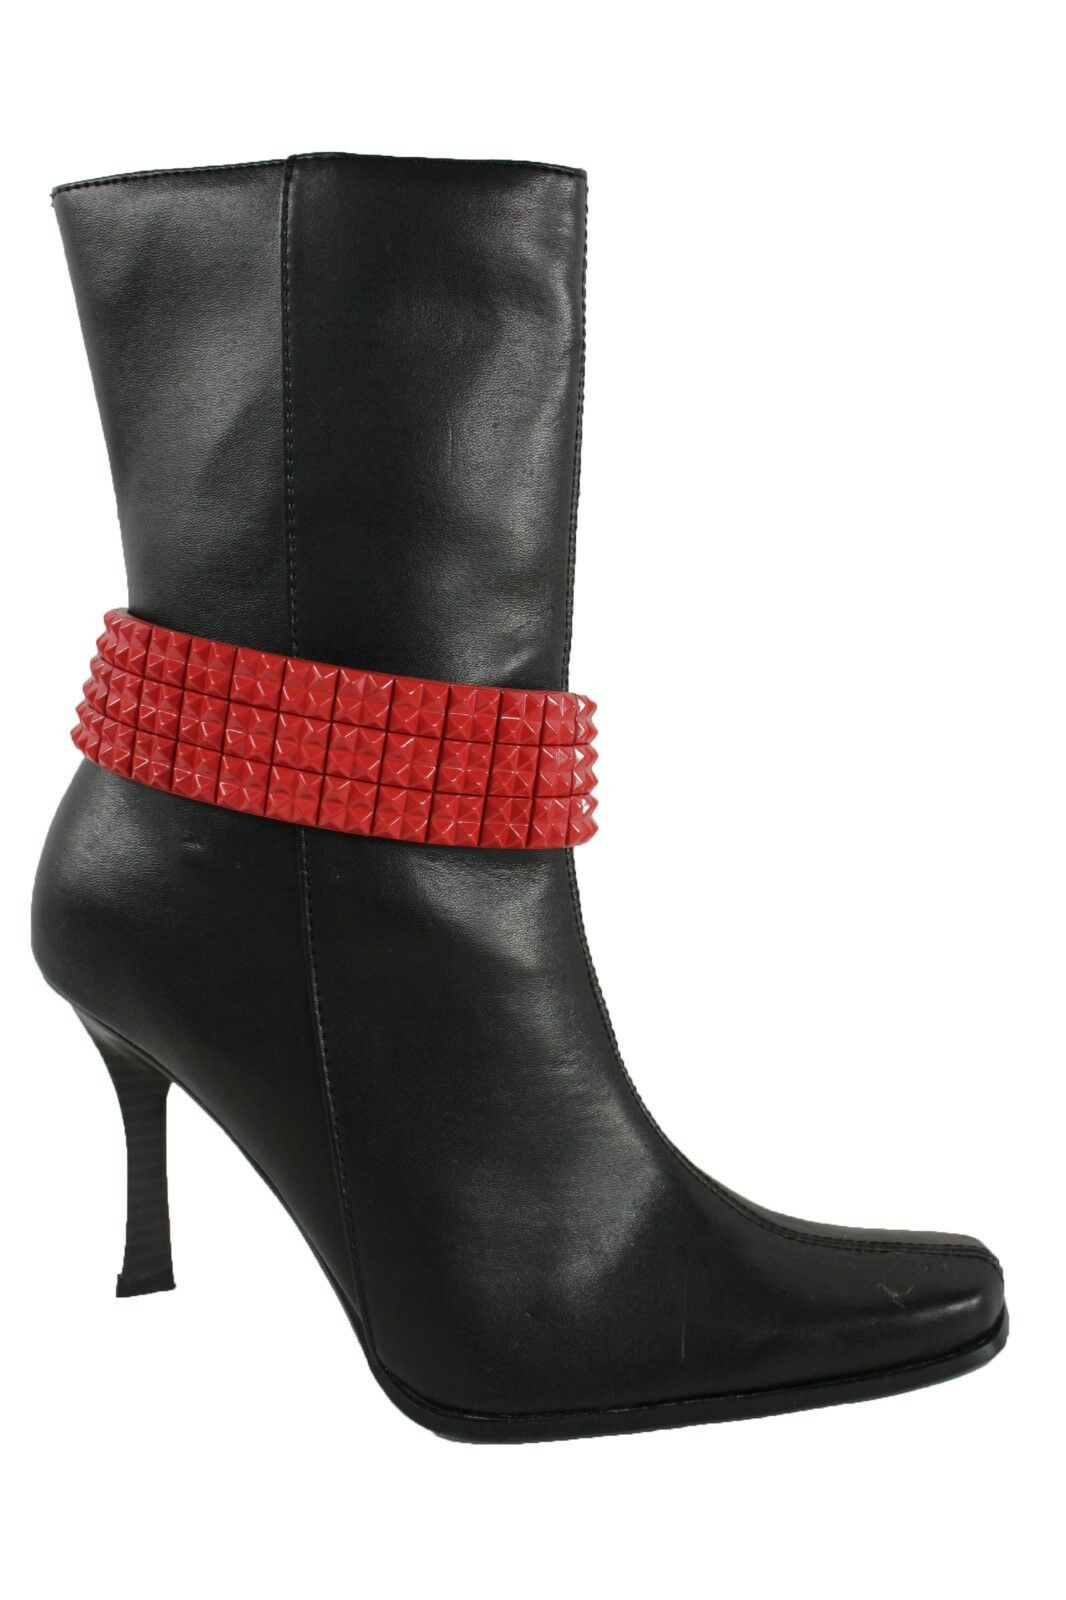 Women Punk Rock Red Pyramid Boot Bracelet Silver Metal Chain Anklet Shoe Charm